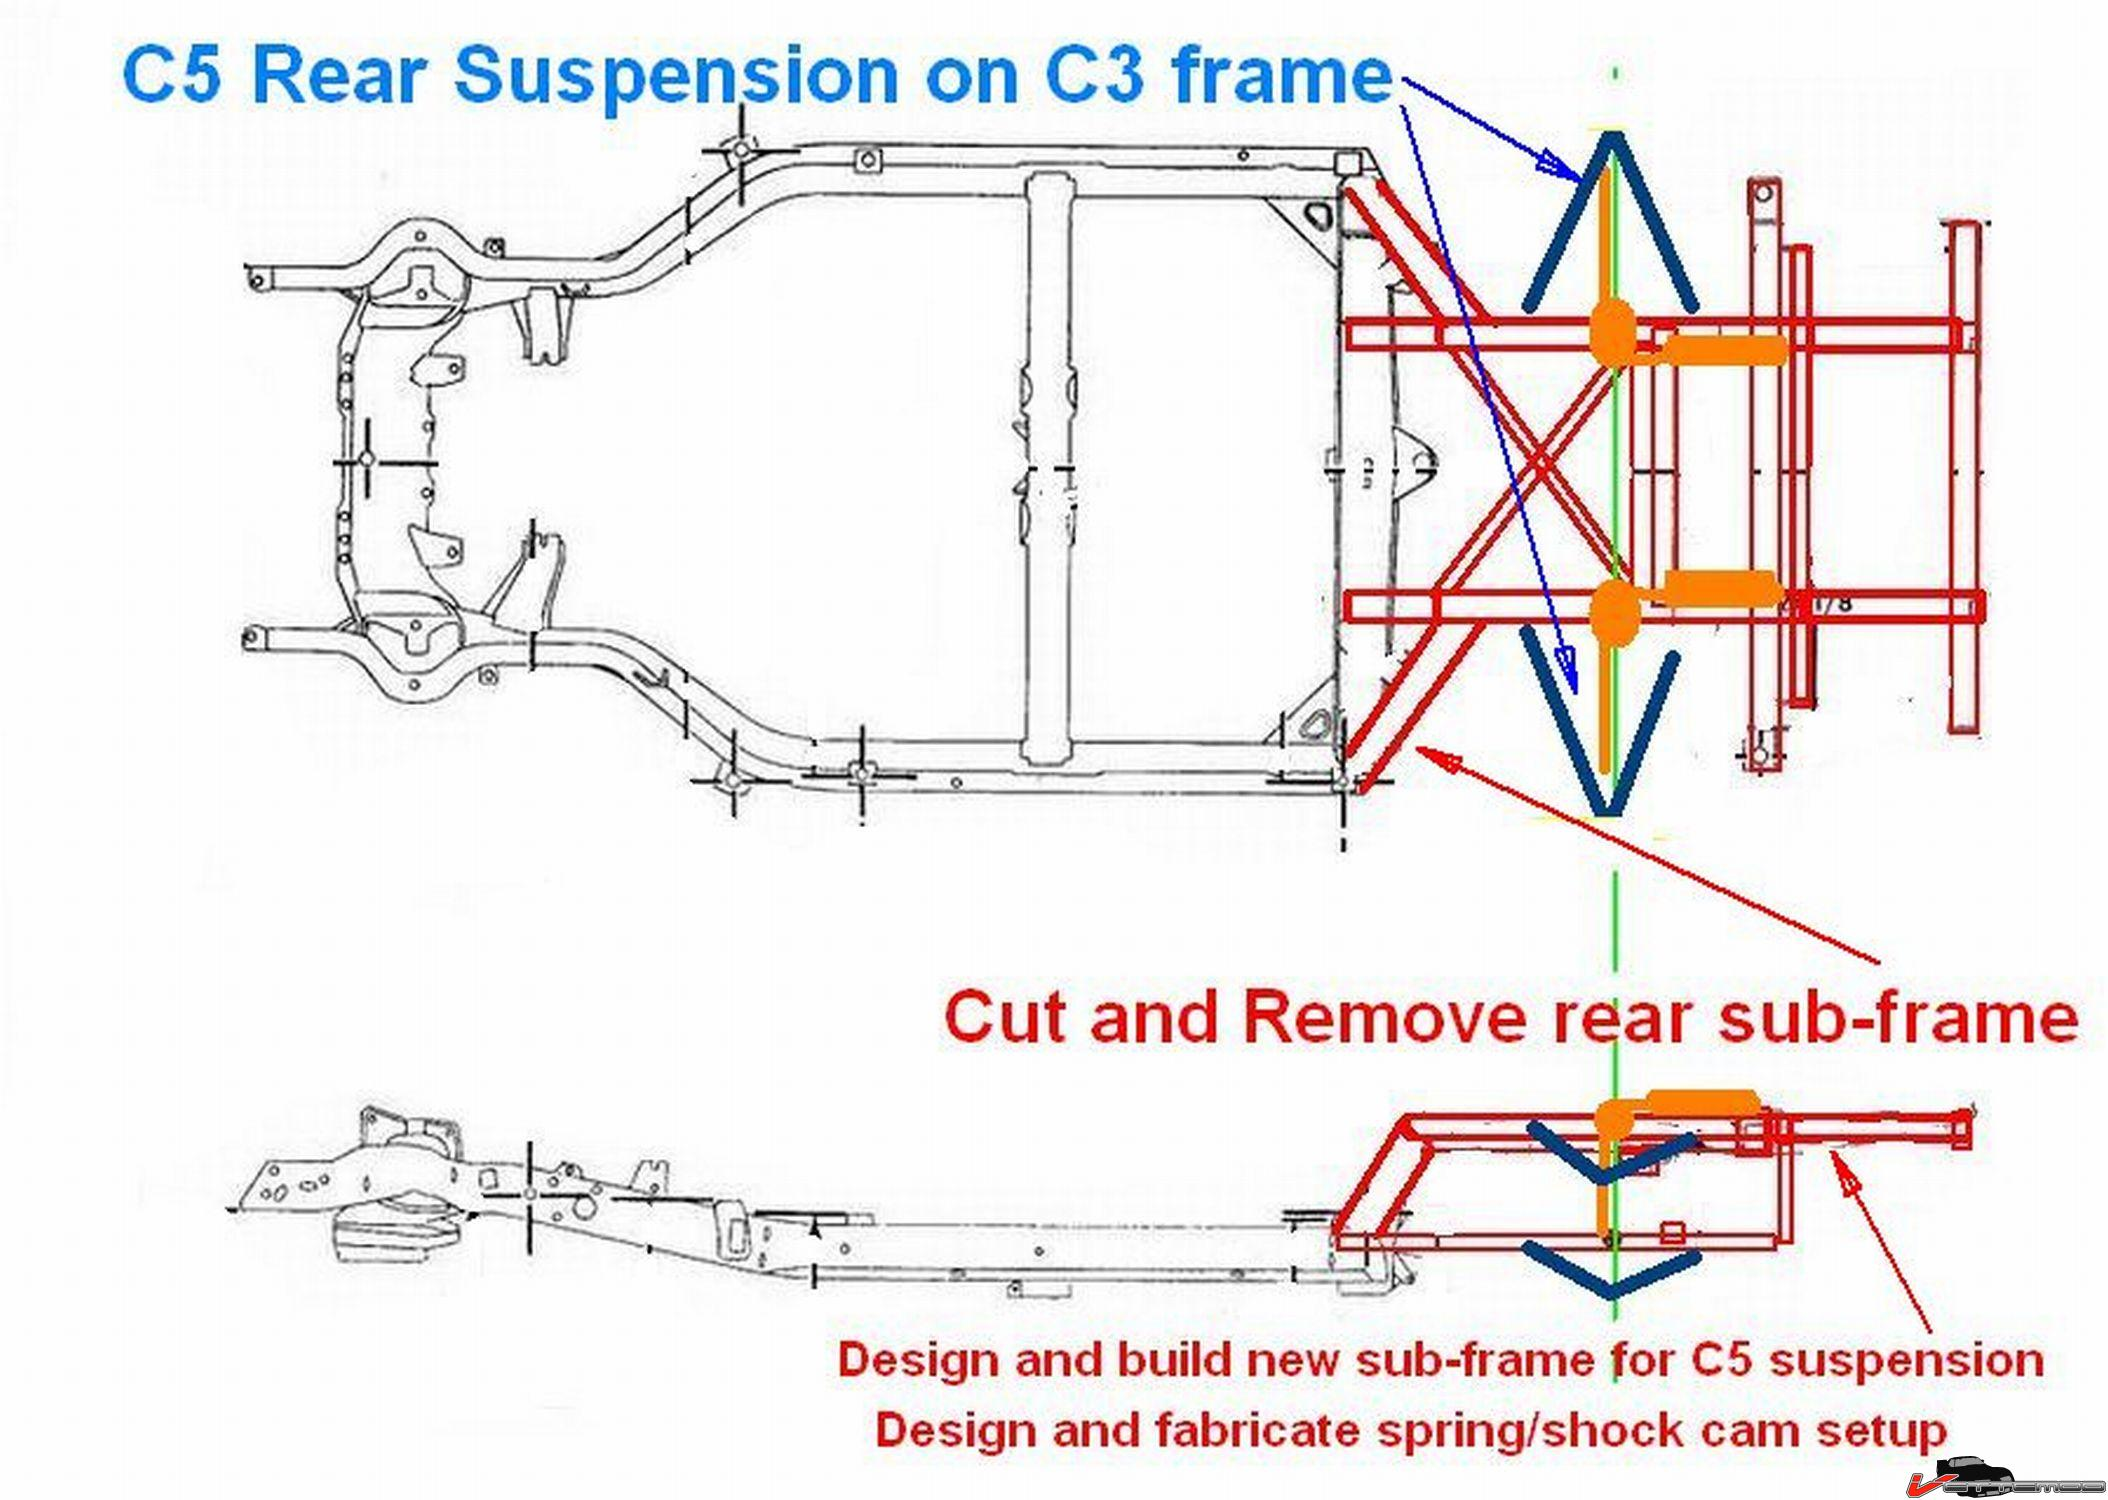 C5 Fuse Diagram Wiring Library C3 Corvette Box